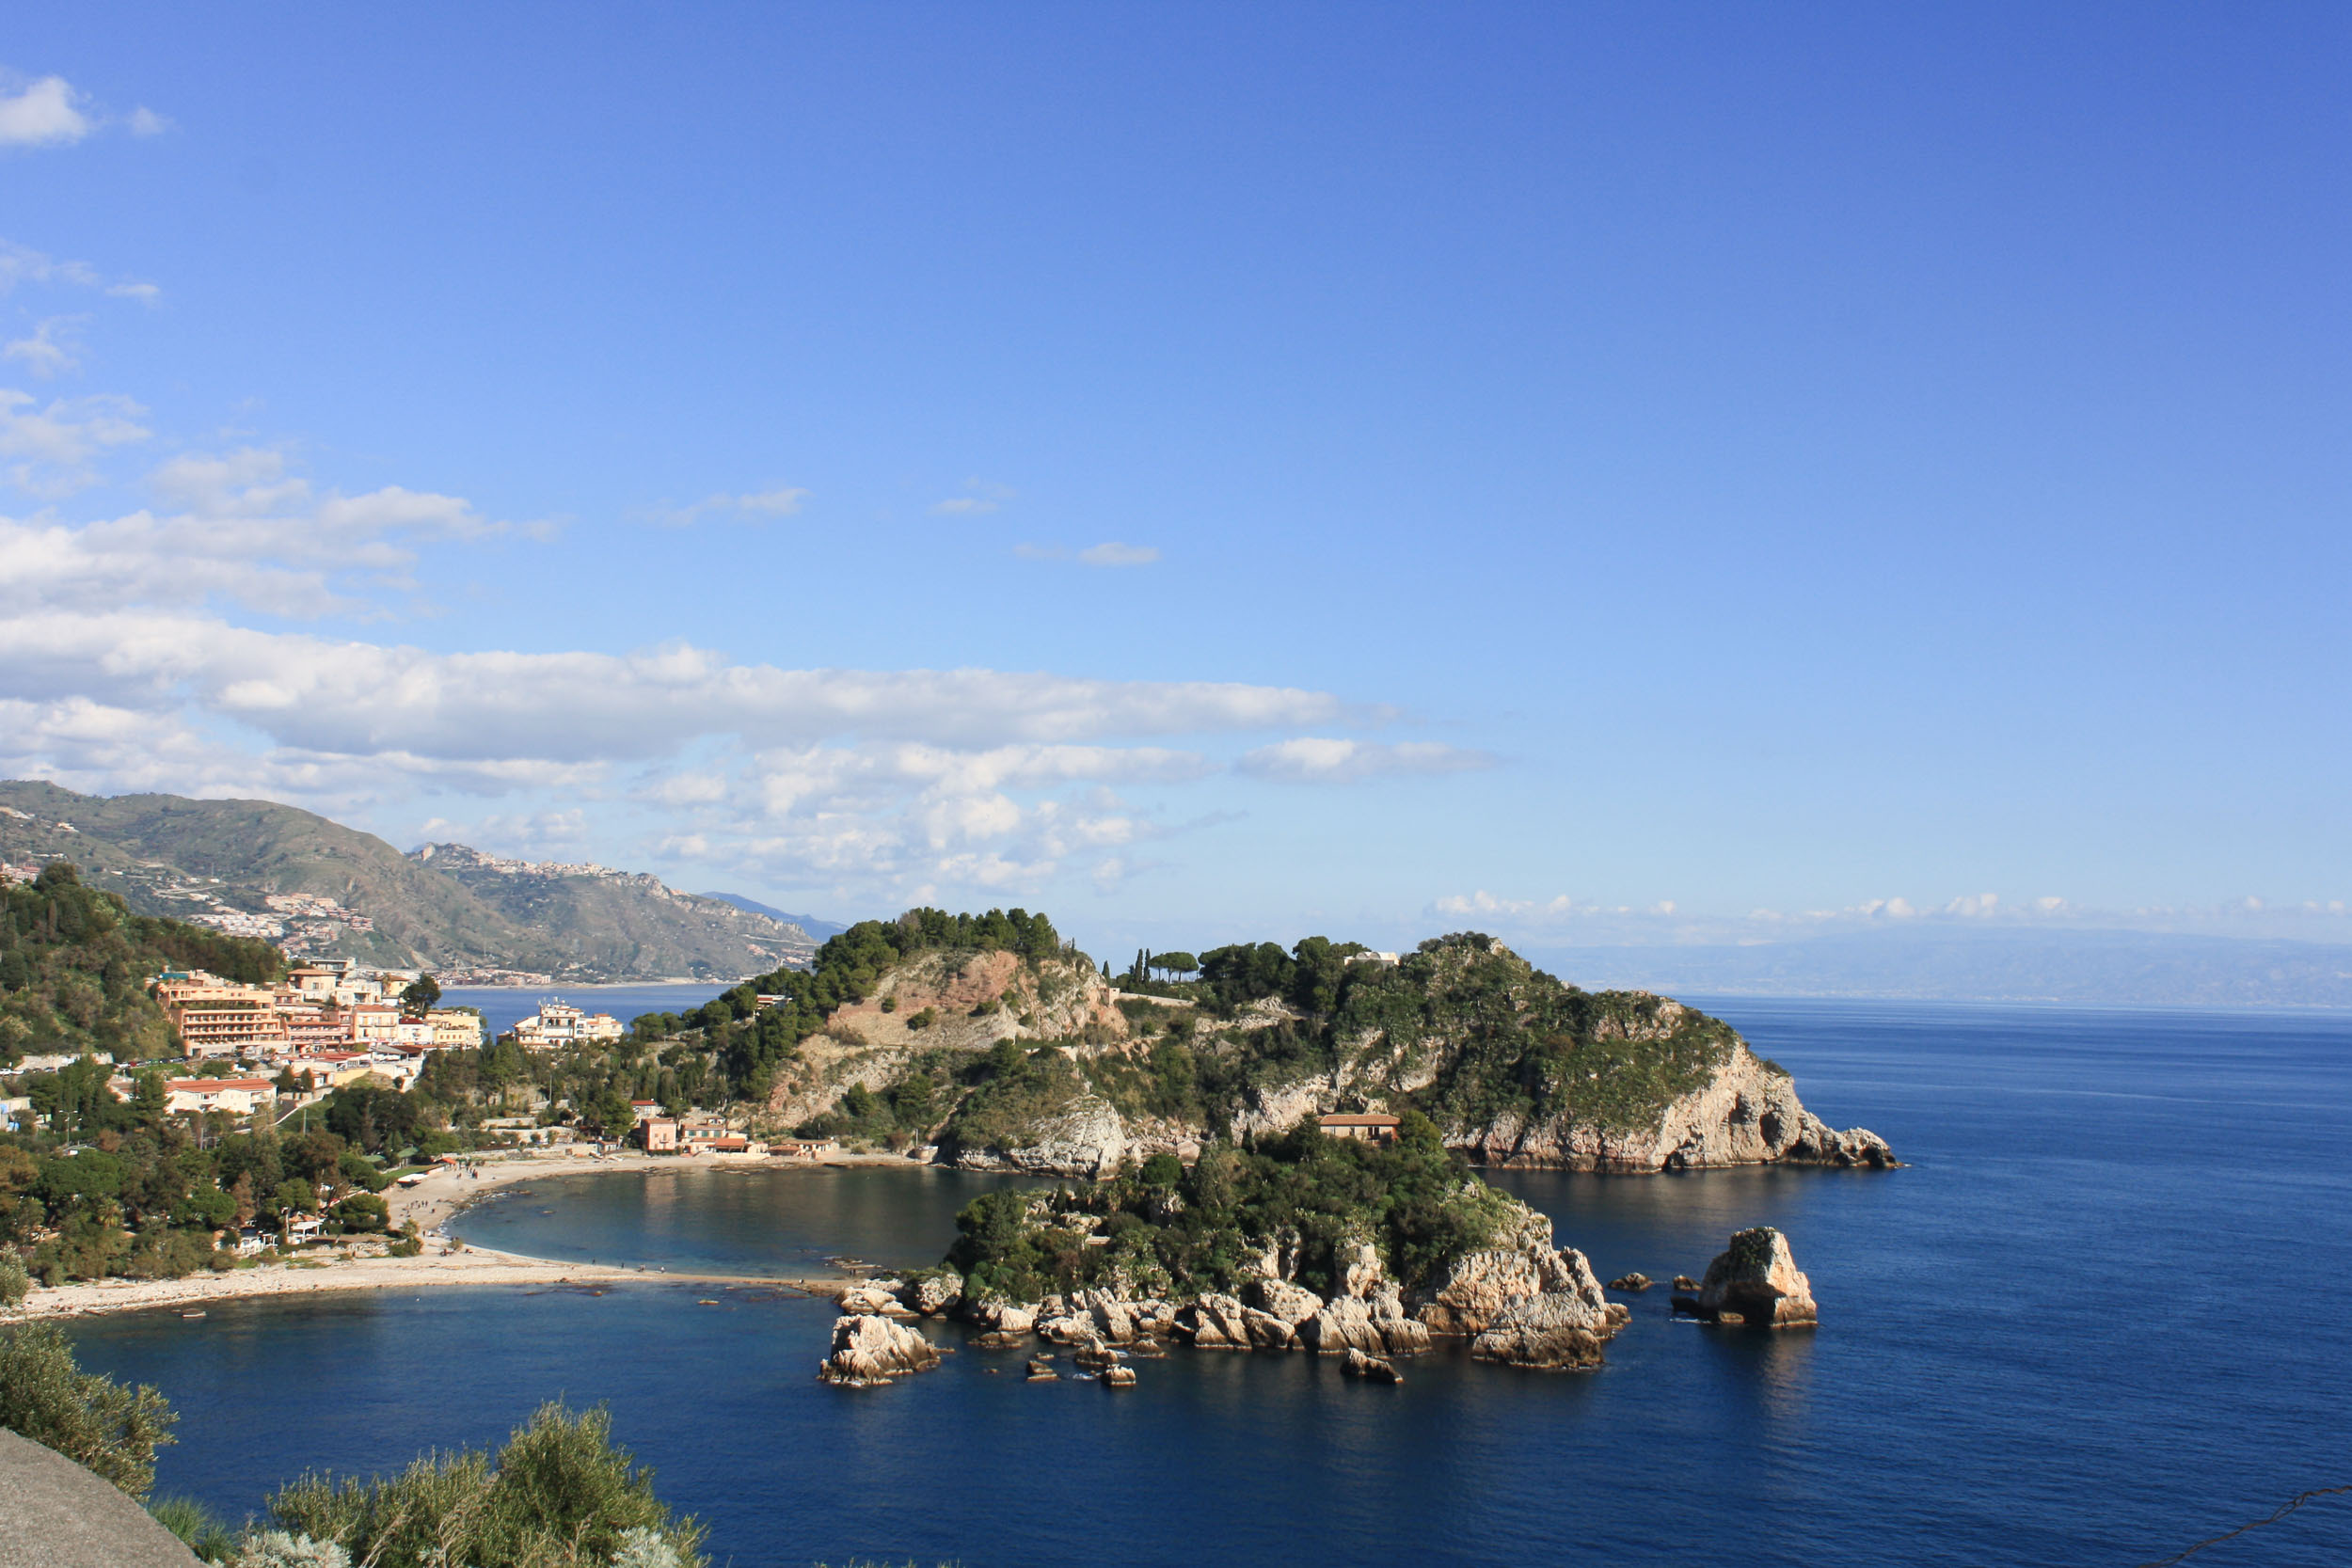 View from La Prora towards Isola Bella